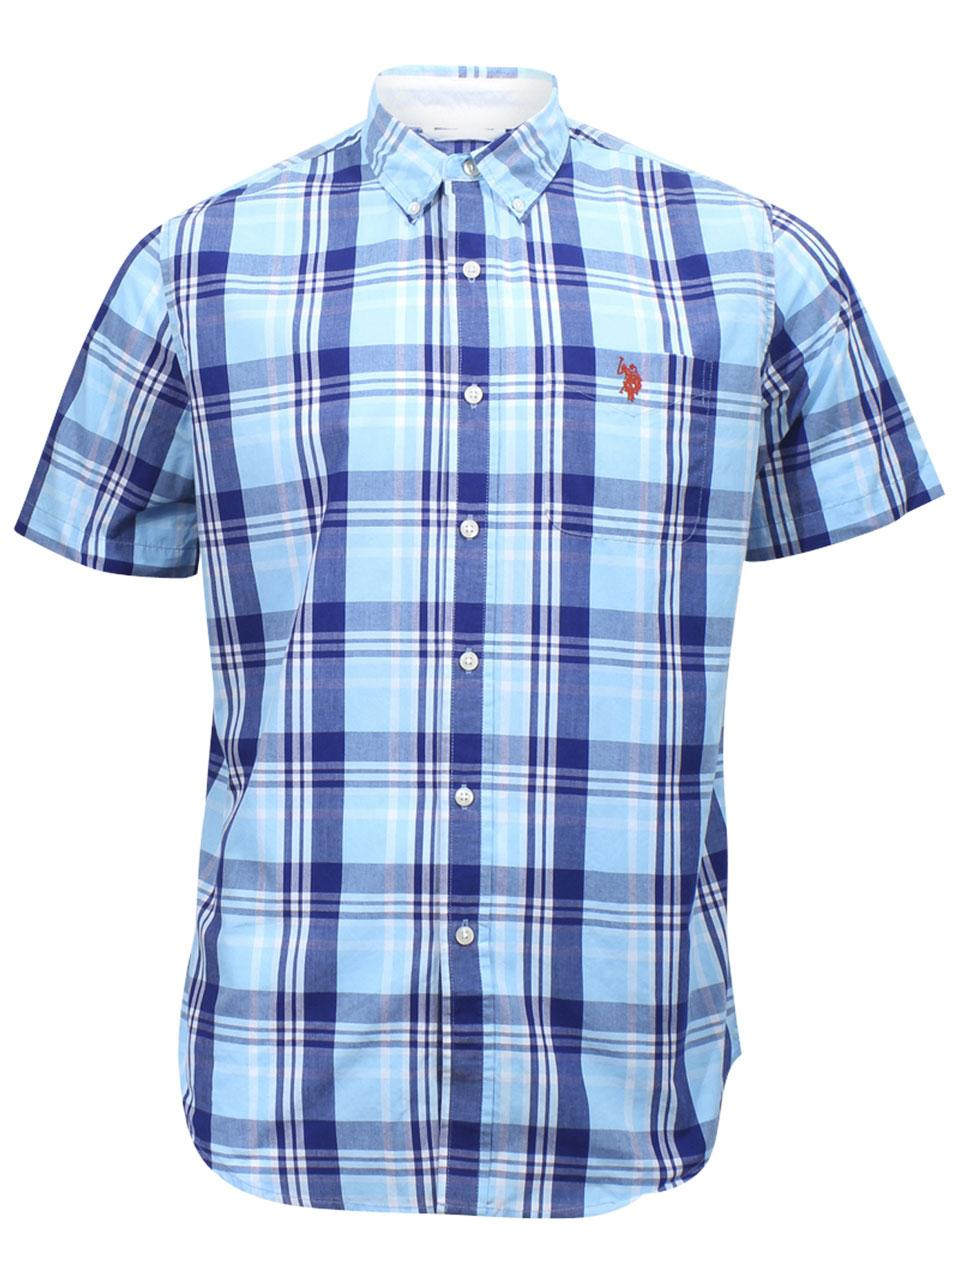 Us Polo Association Mens Short Sleeve Collar Stays Plaid Button